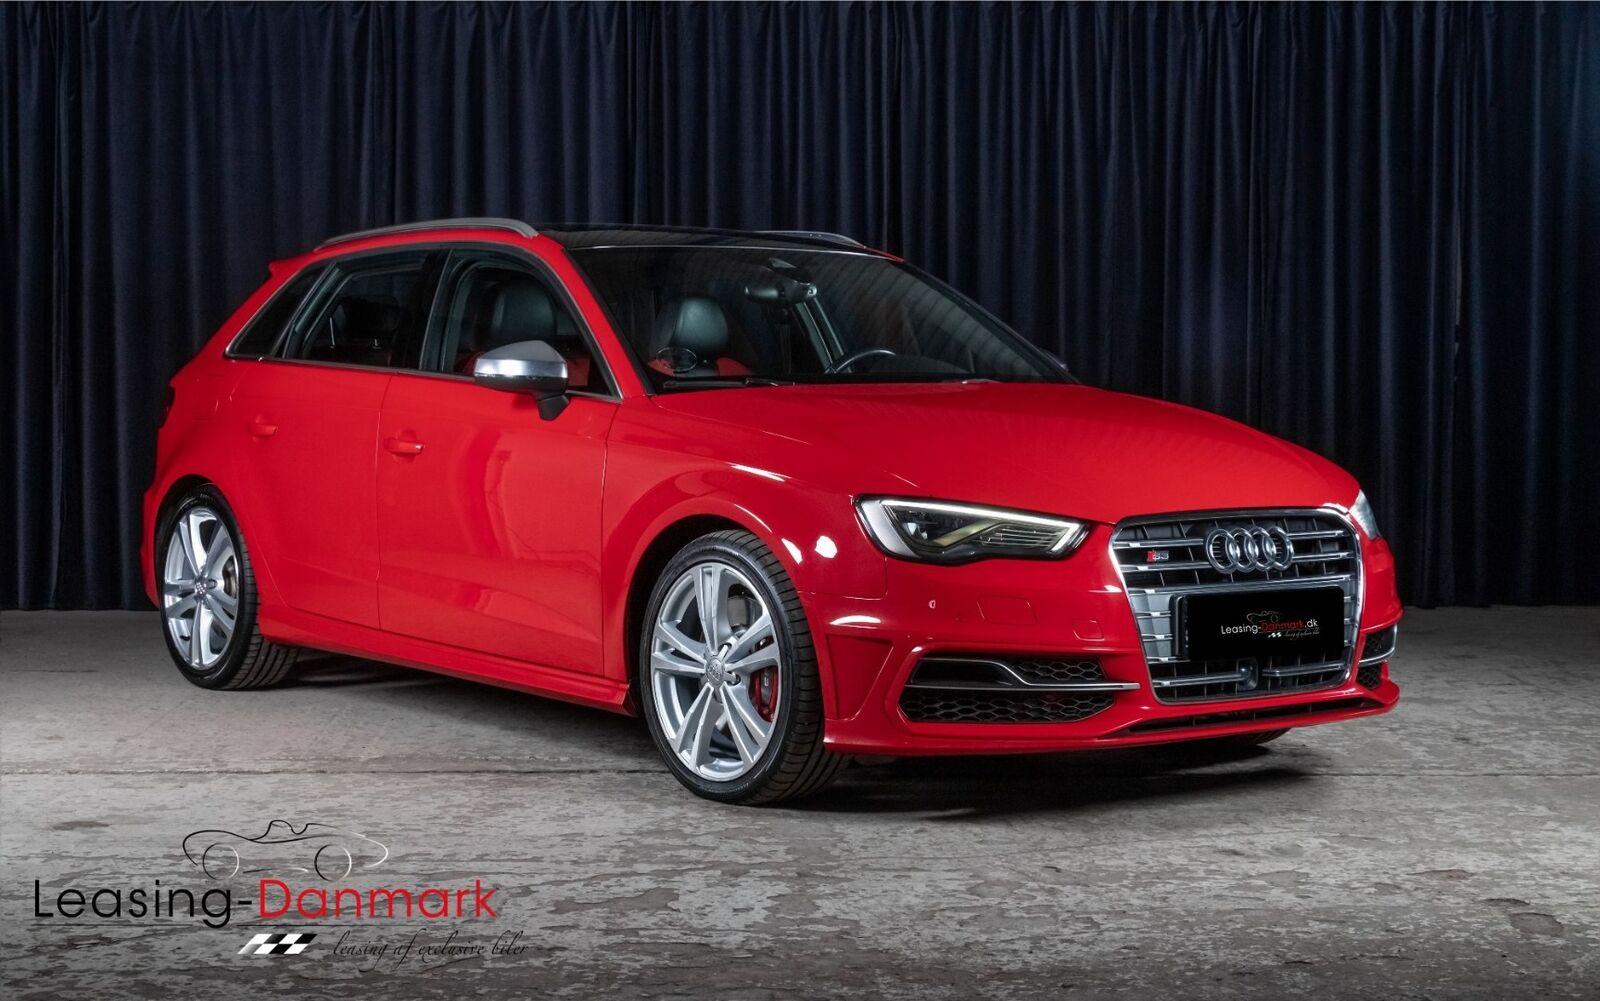 Audi S3 2,0 TFSi Sportback quattro S-tr. 5d - 359.900 kr.